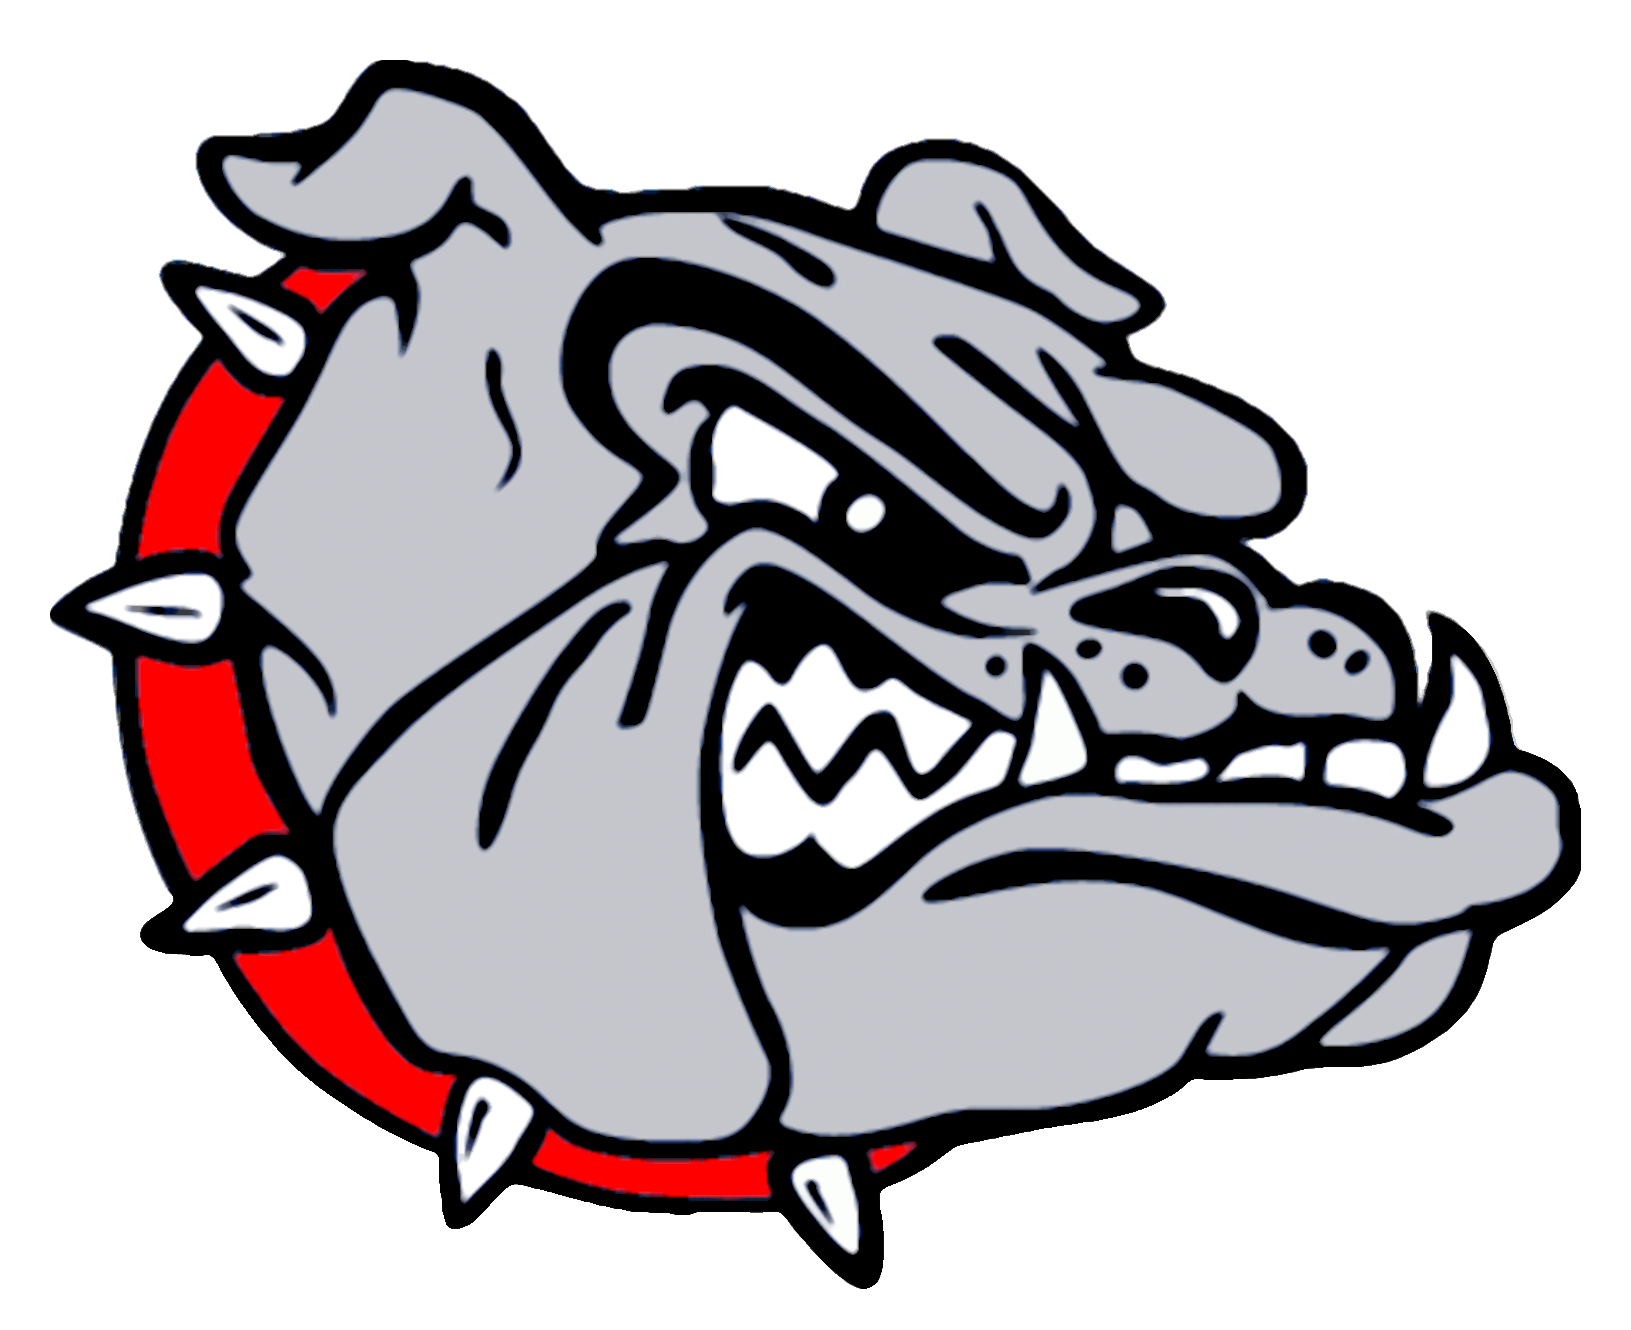 bulldog mascots | Shared By: 11-13-2012 | Wrestling ...